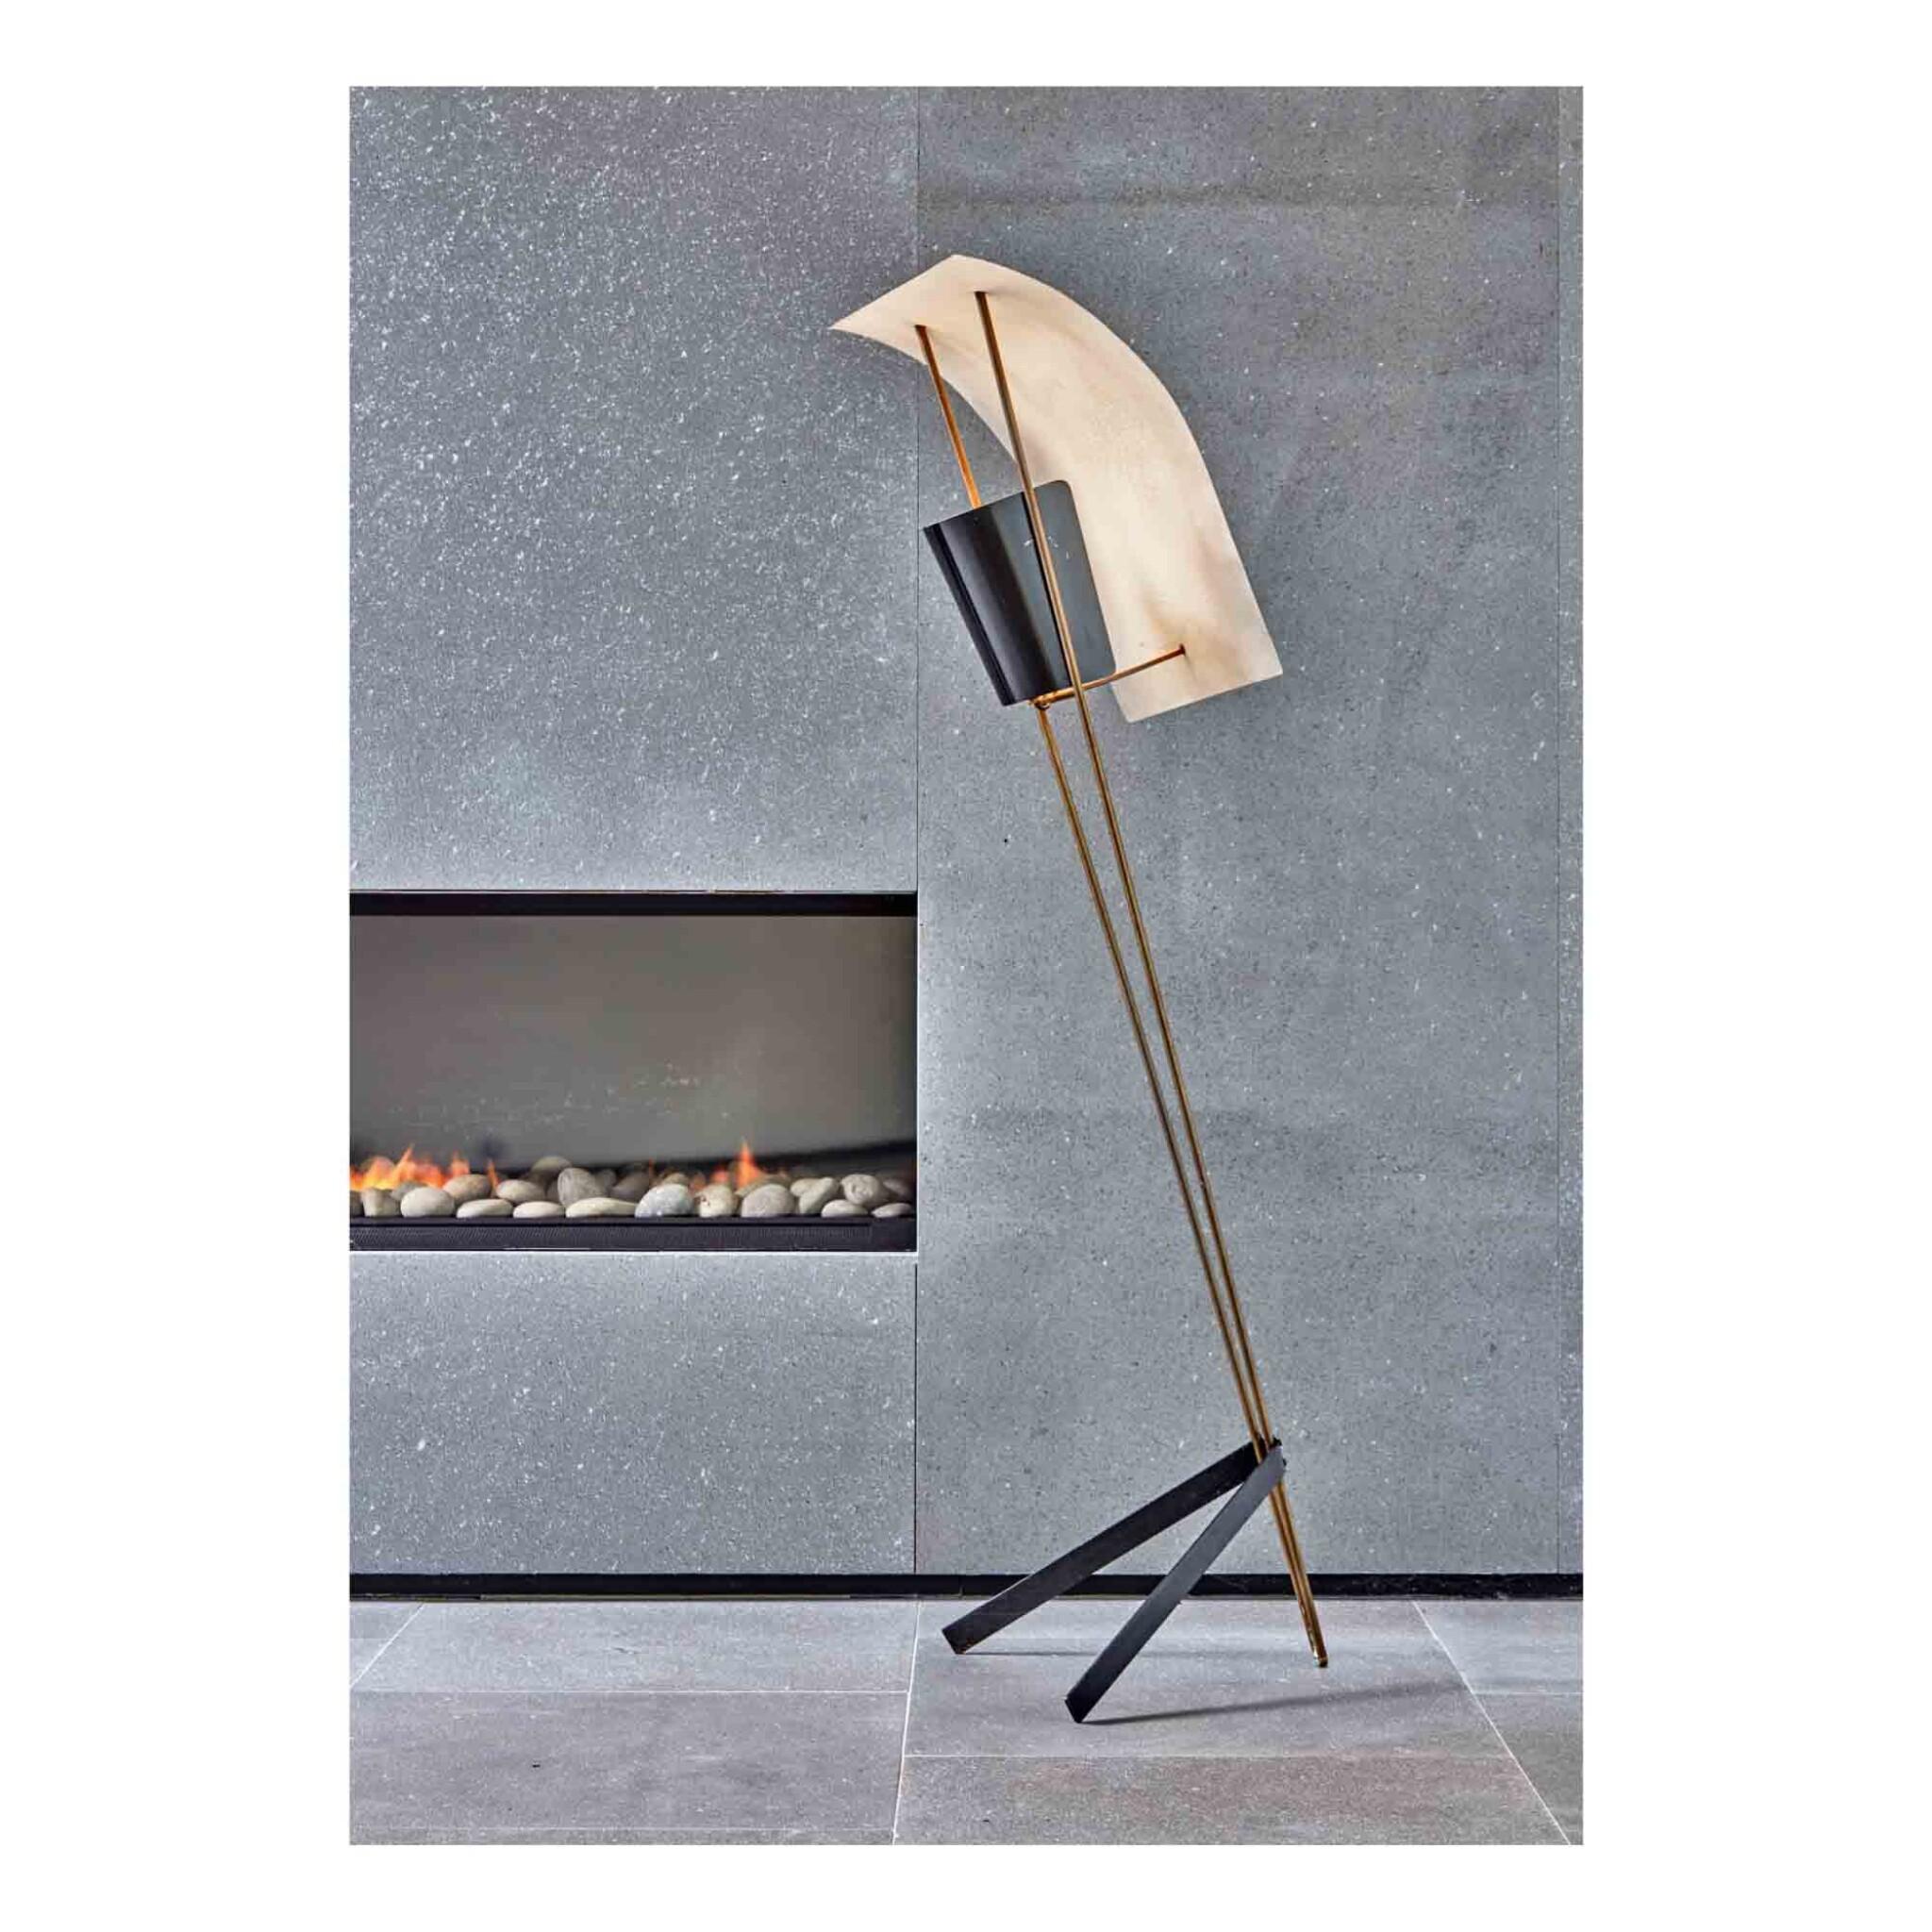 "View 1 of Lot 392. ""Cerf-Volant"" Floor Lamp, Model No. G30."